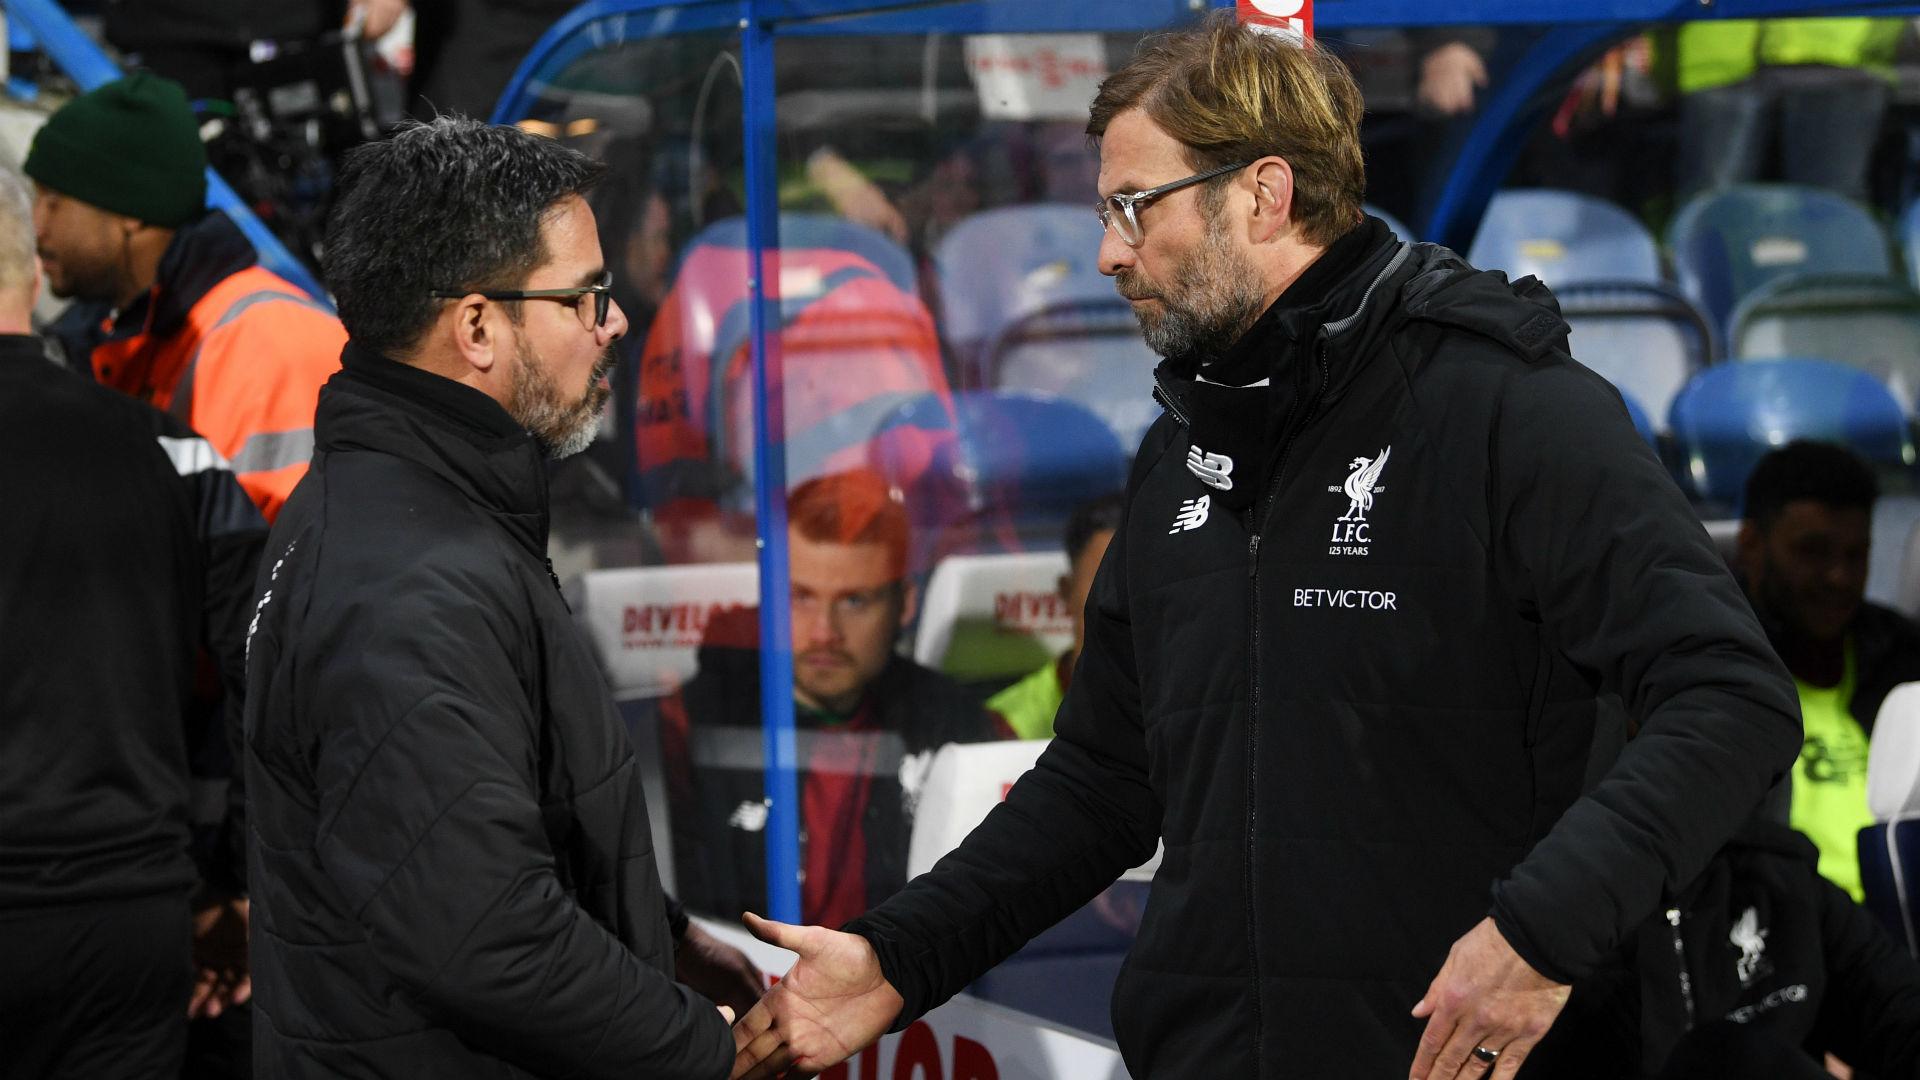 'My Dortmund friends won't like to hear it!' - Klopp congratulates Schalke on Wagner hire